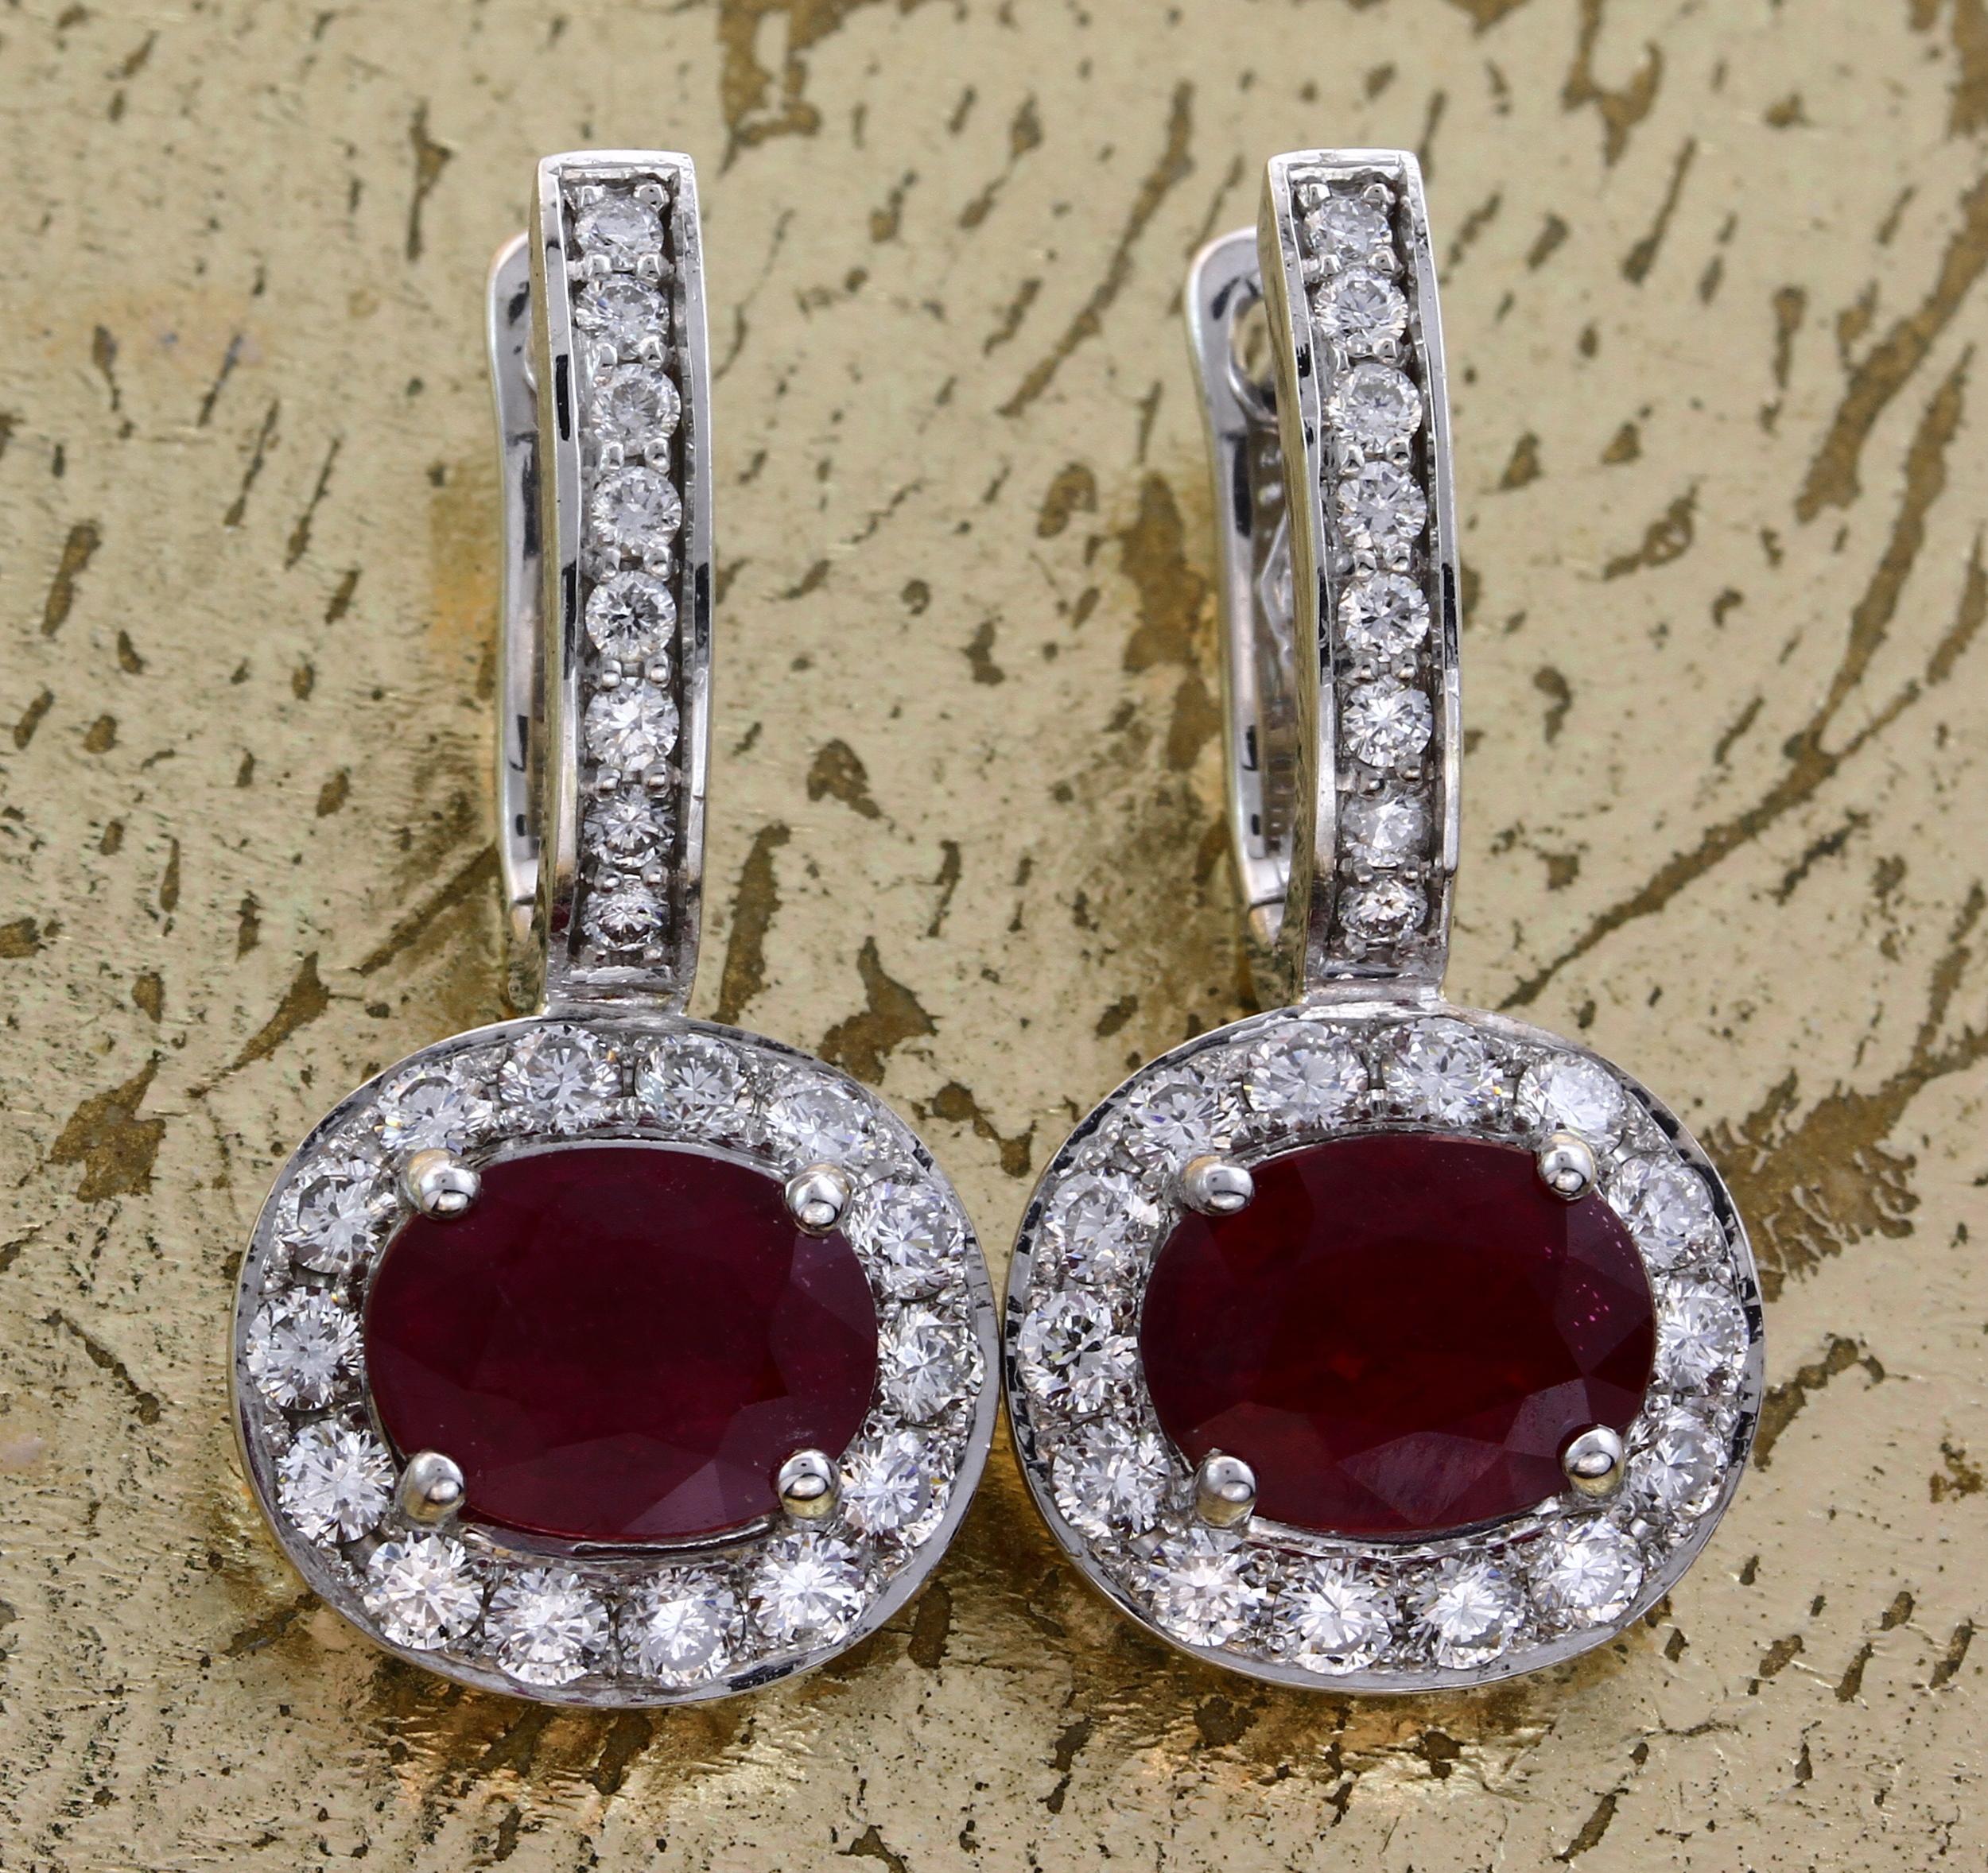 Earrings Oval Rubies with Diamonds Item No: 0013779